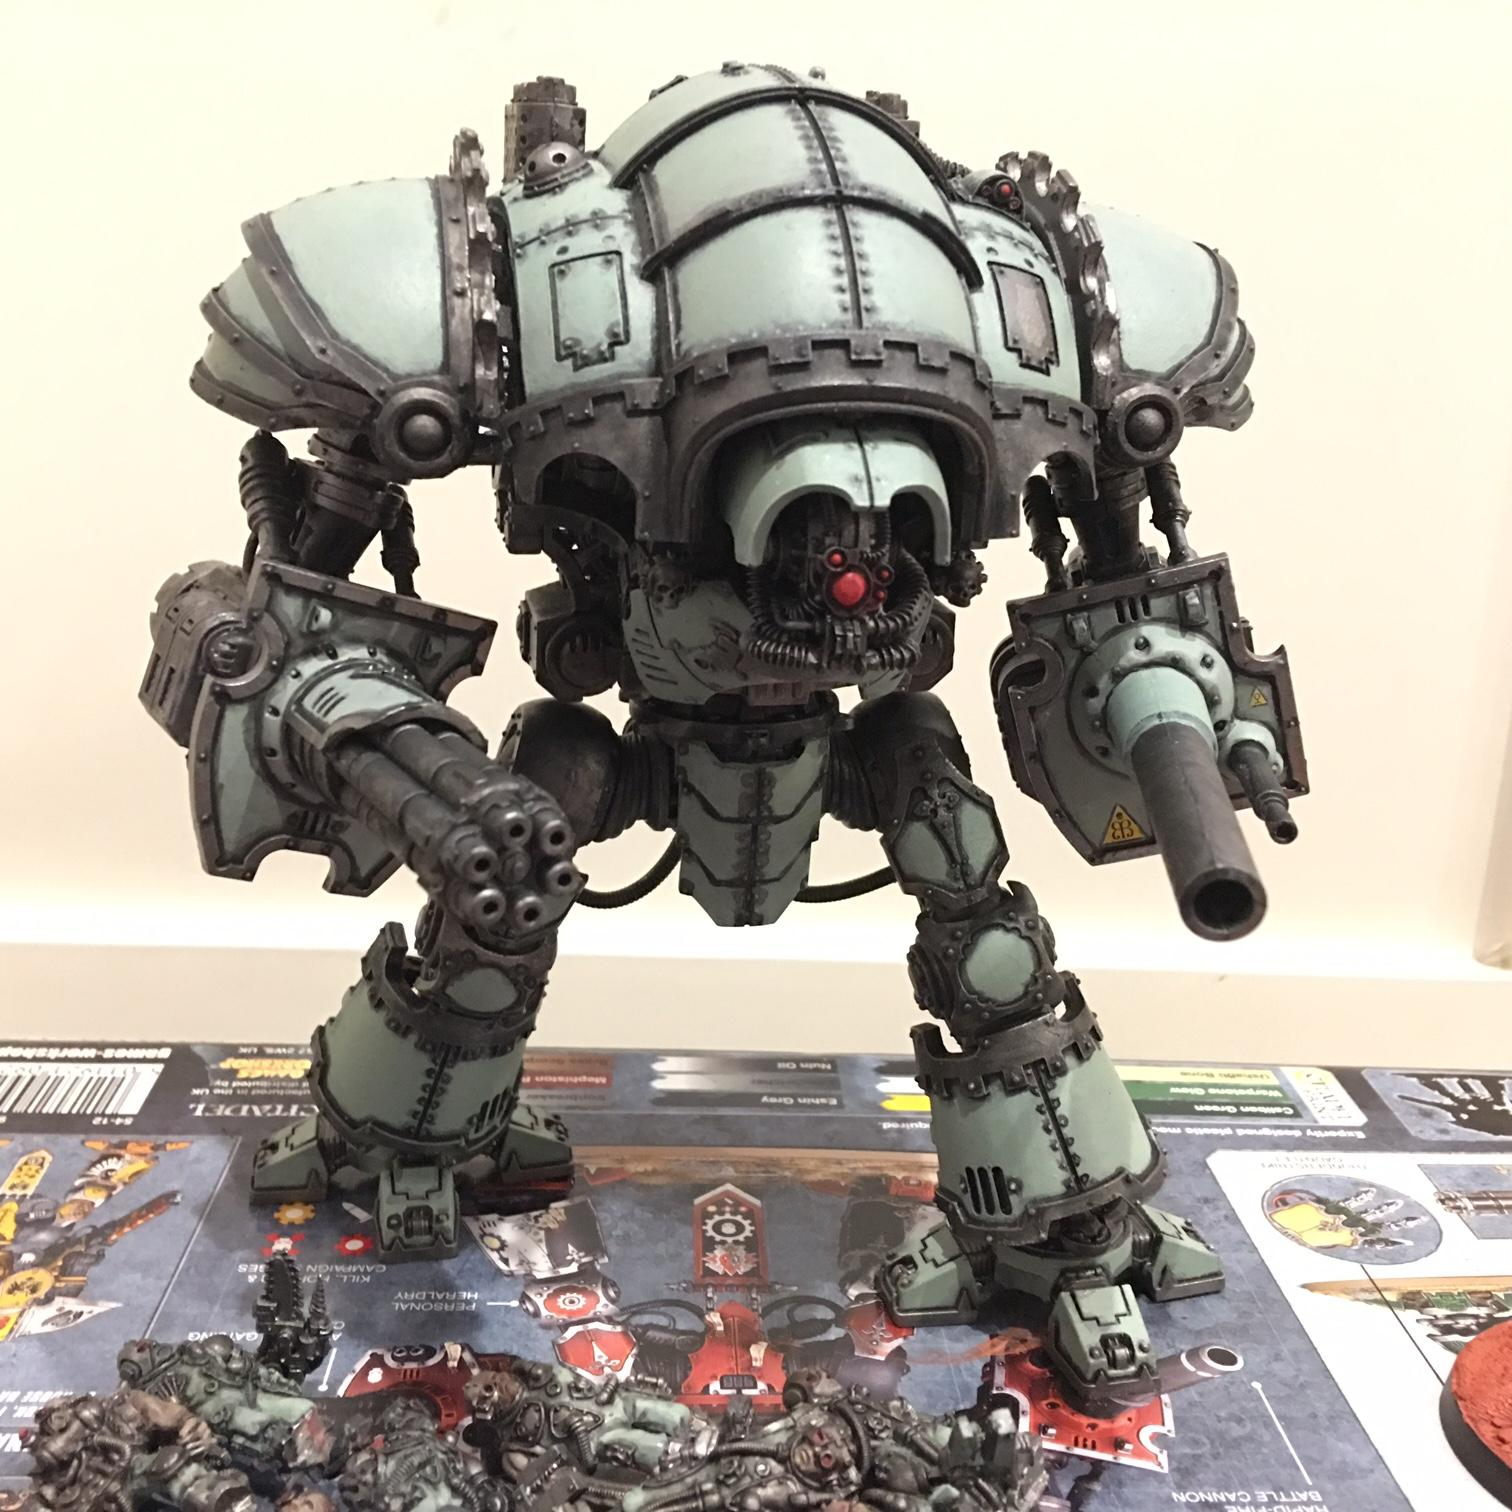 Adeptus Mechanicus, Imperial Knight, Phobos, Warhammer 40,000